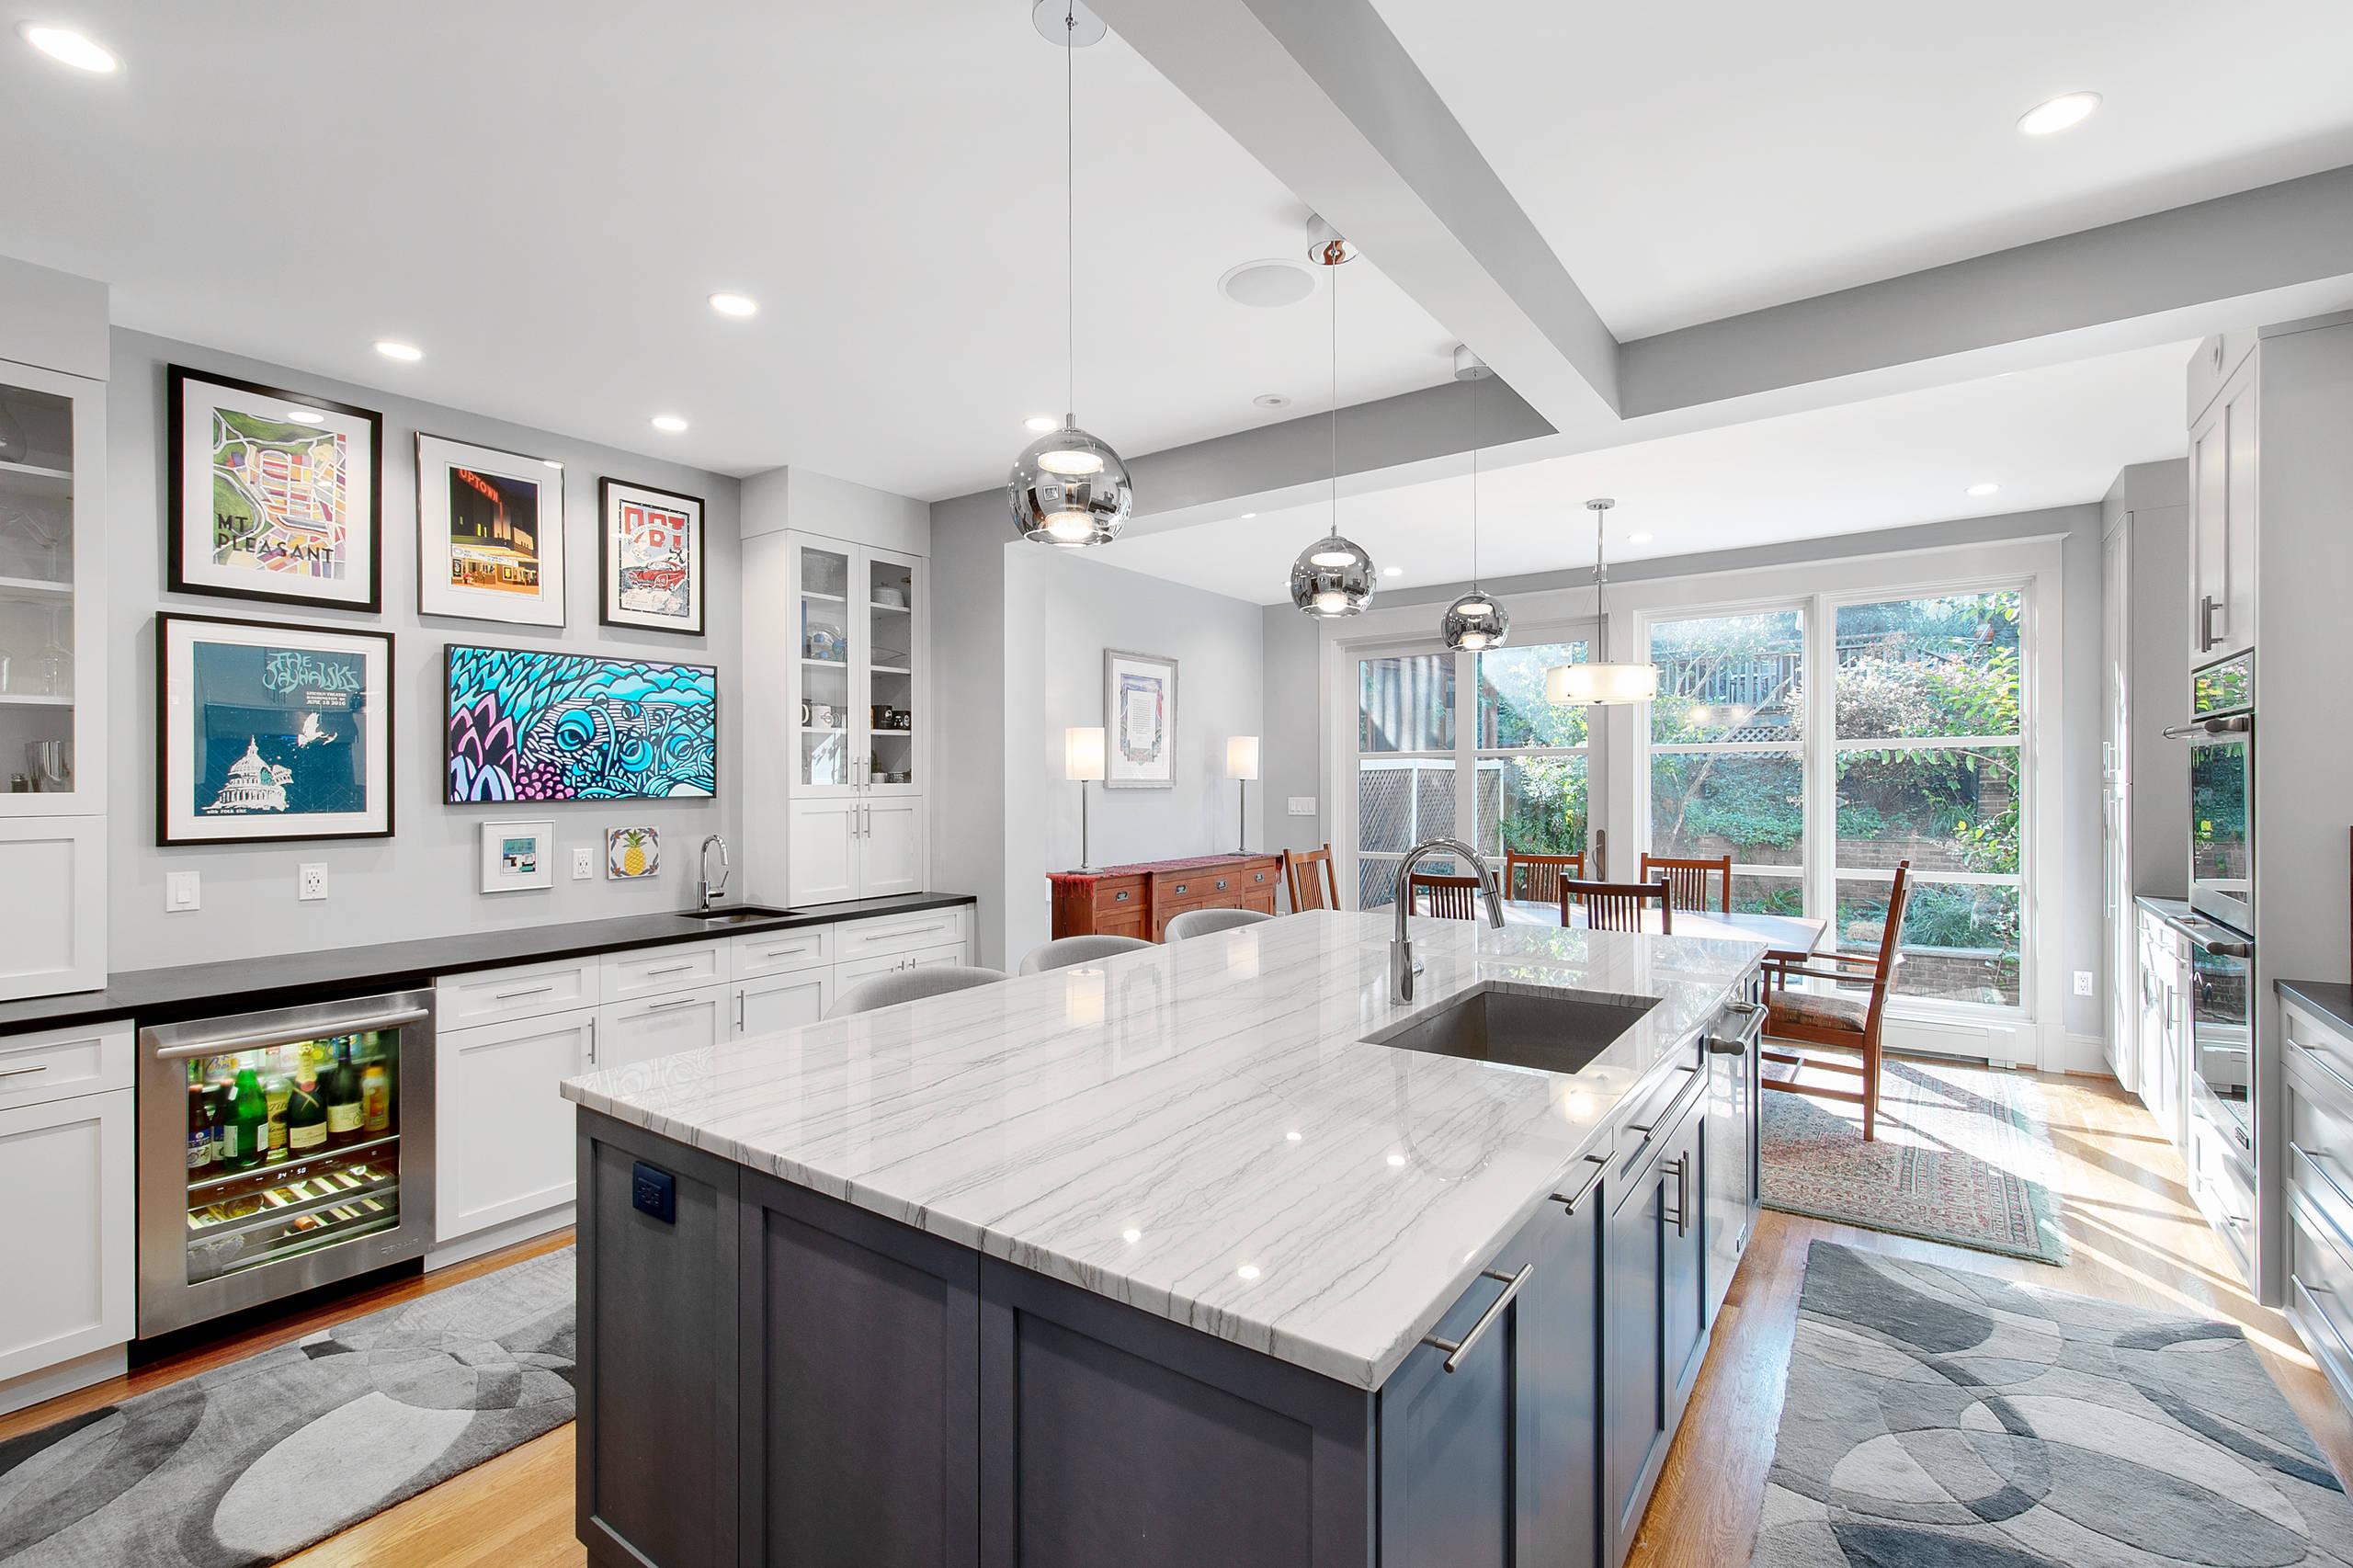 Kitchen Expansion & Interior Remodeling